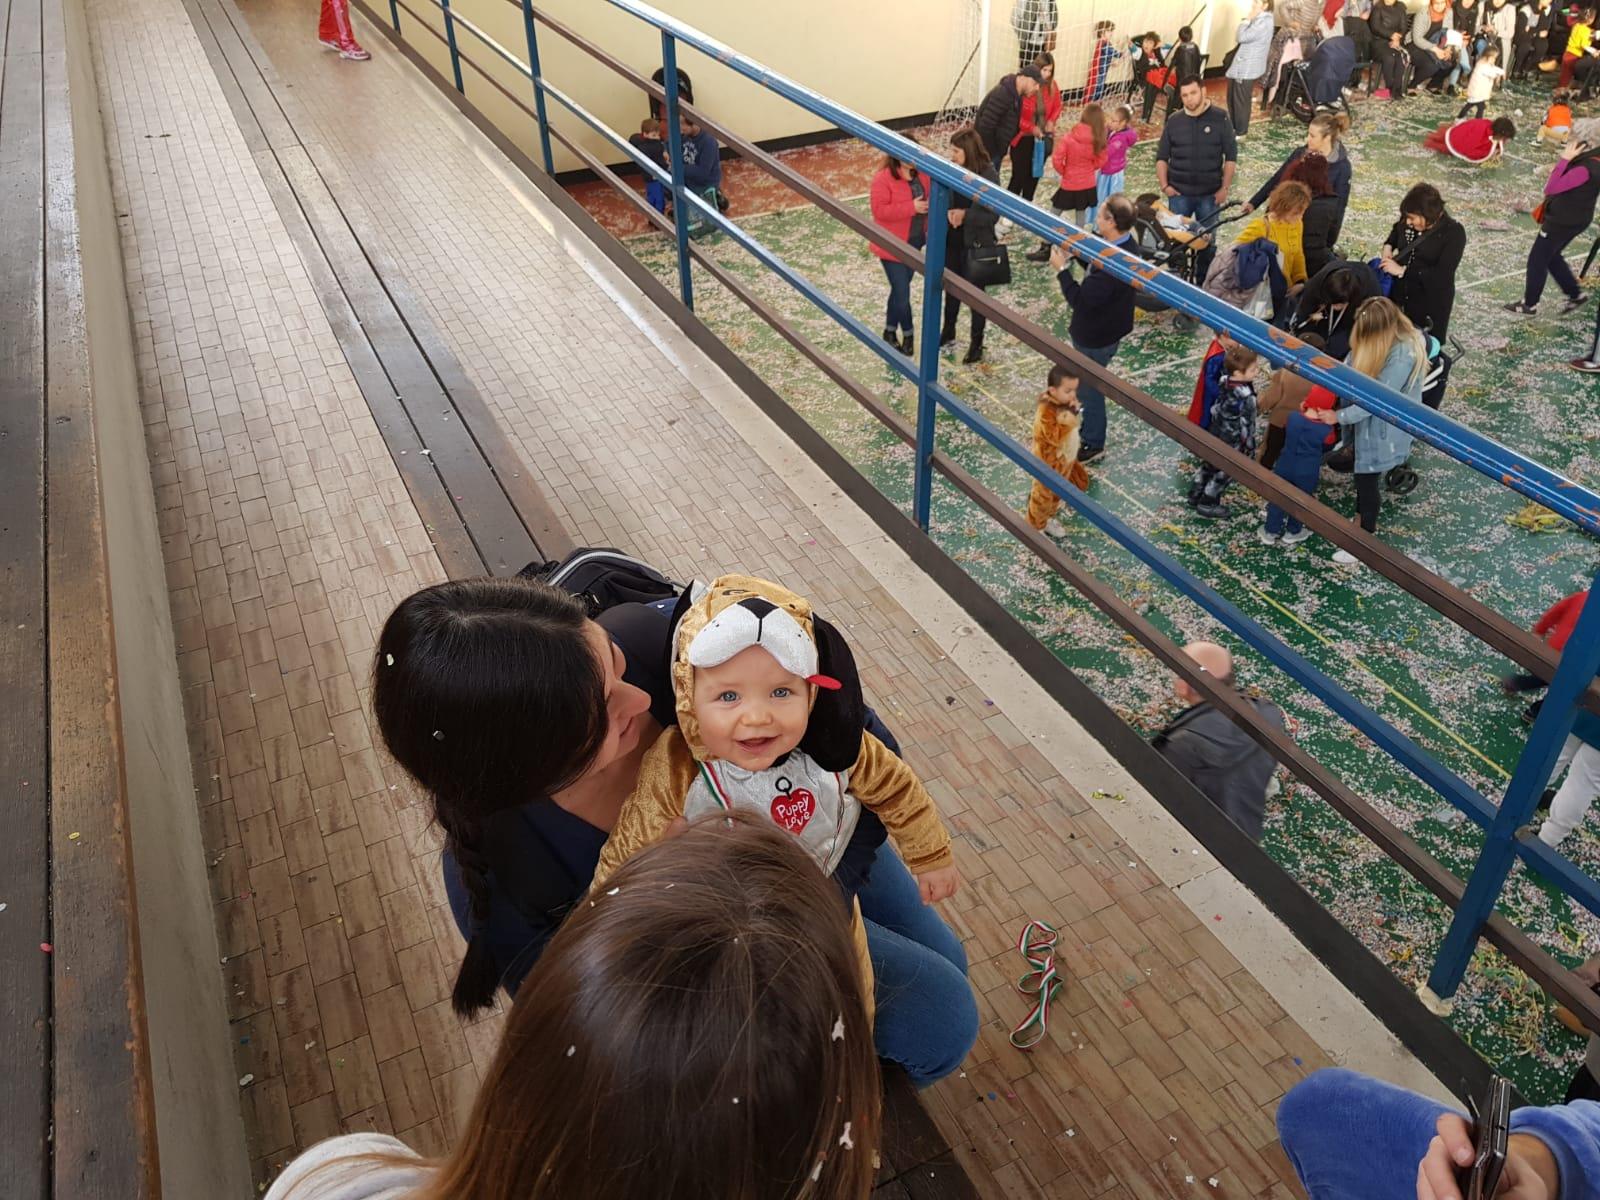 Baraonda Carnevale 2019 (293)